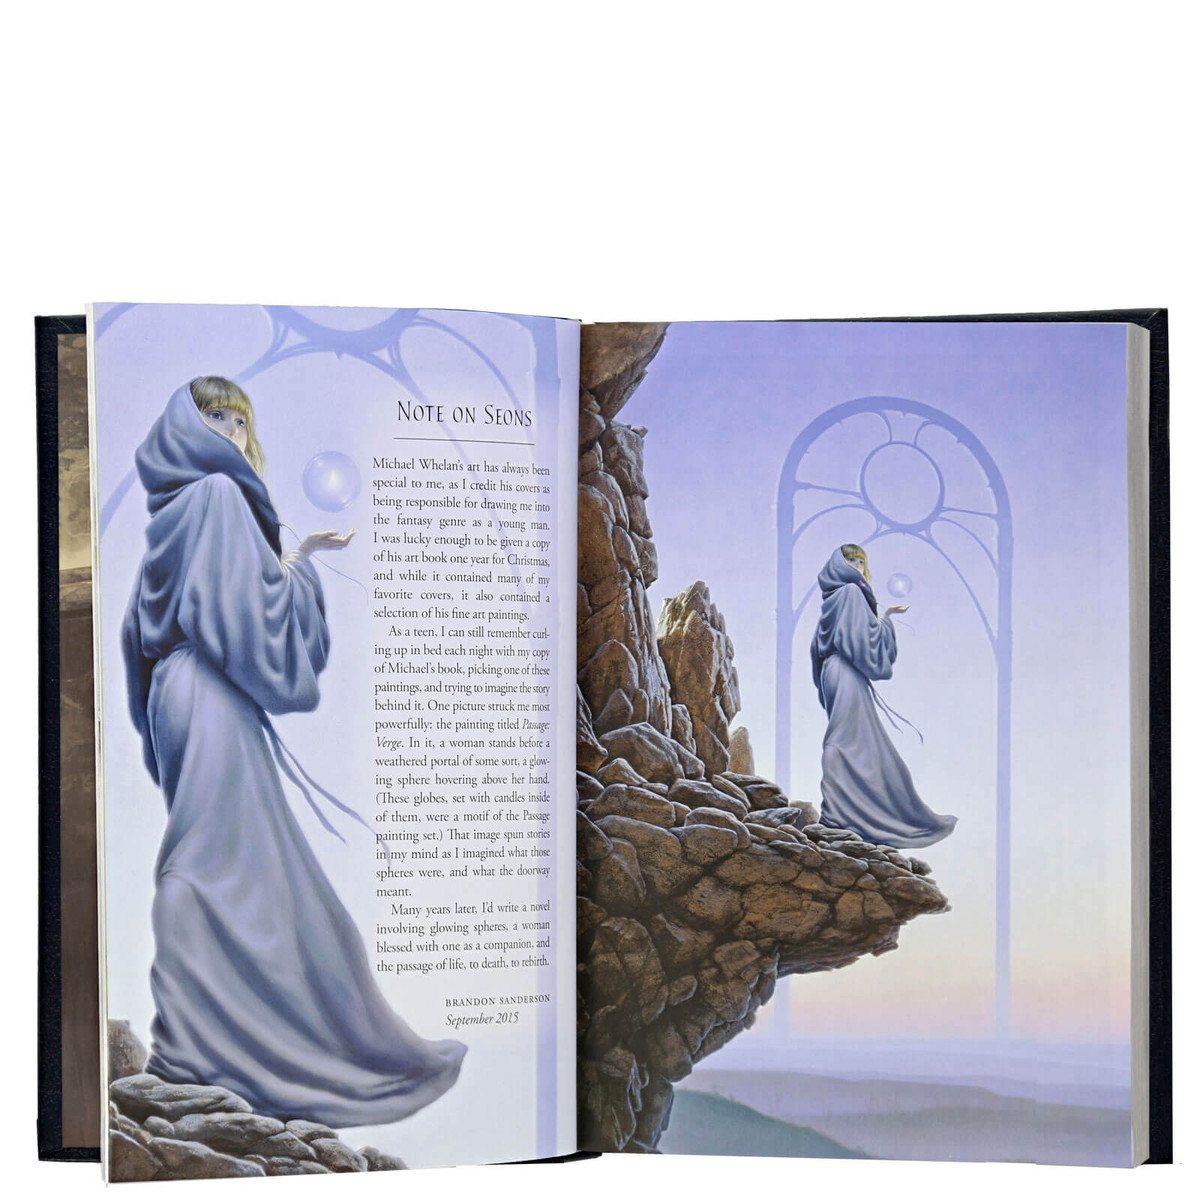 Dragonsteel - X Anniversary - Elantris - Arte Interior, Michael Whelan